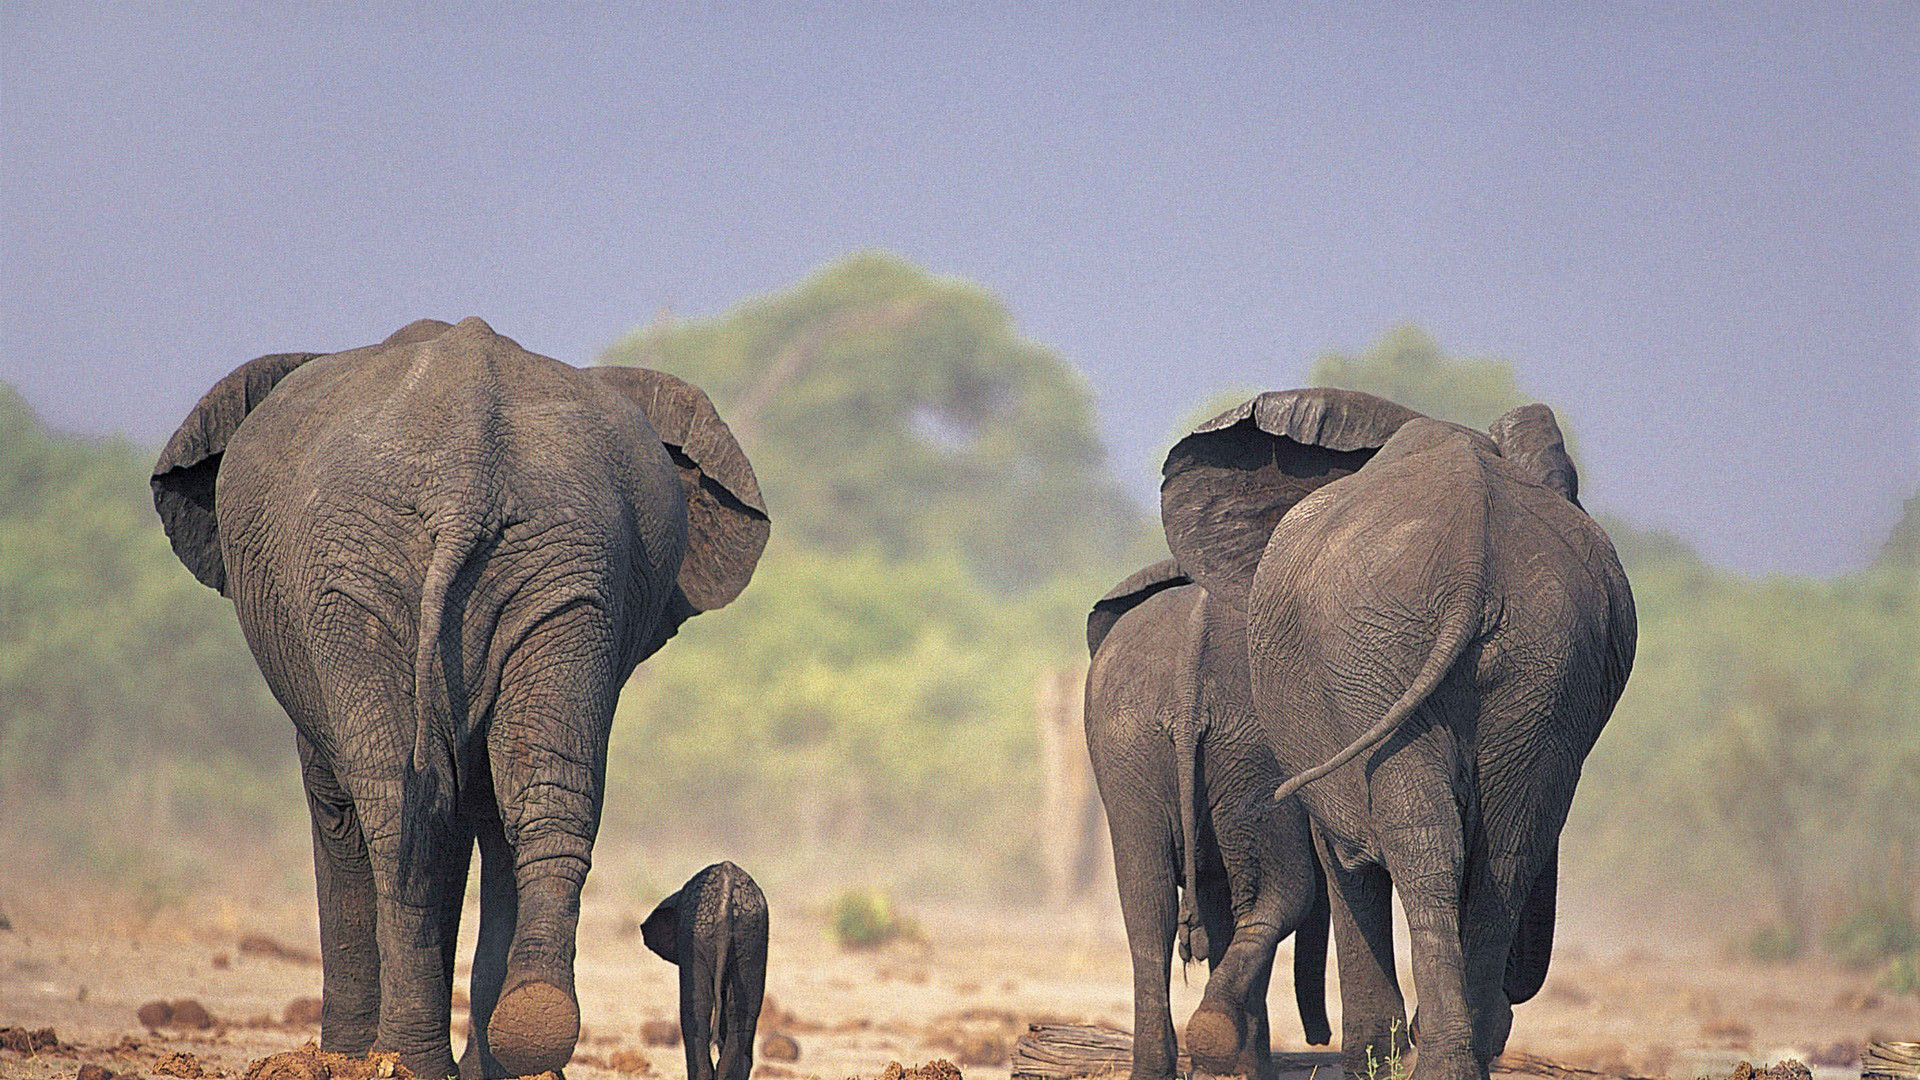 Elephant Wallpaper (73+ Images